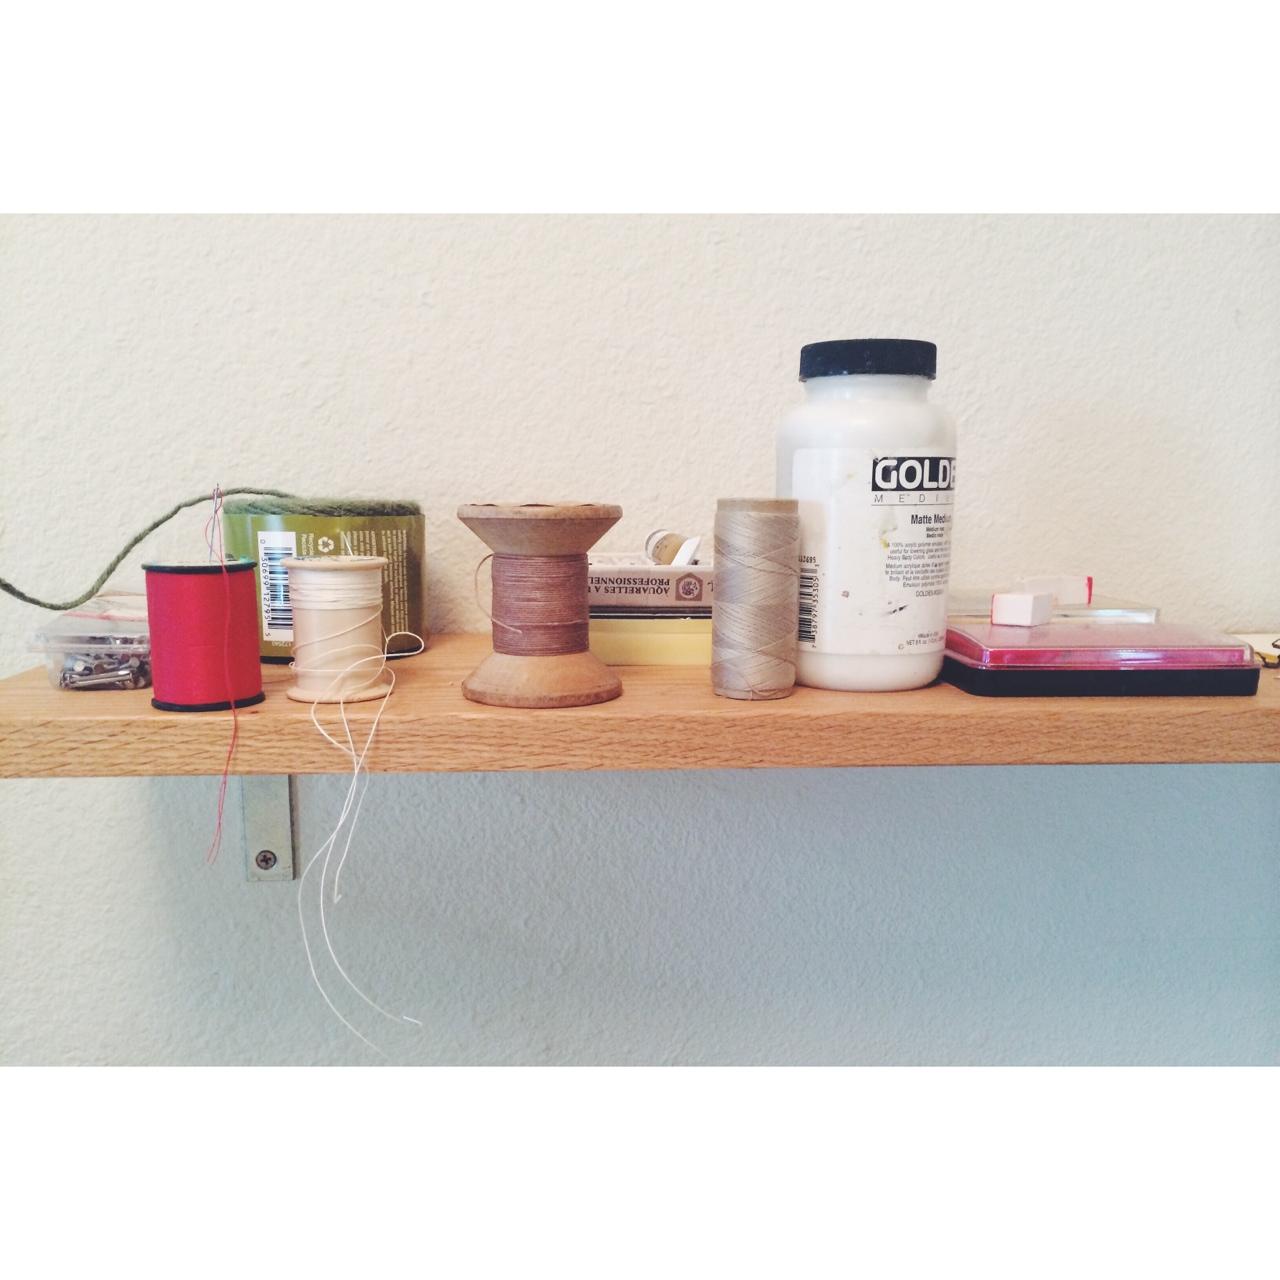 needle, thread, gel medium, and ink